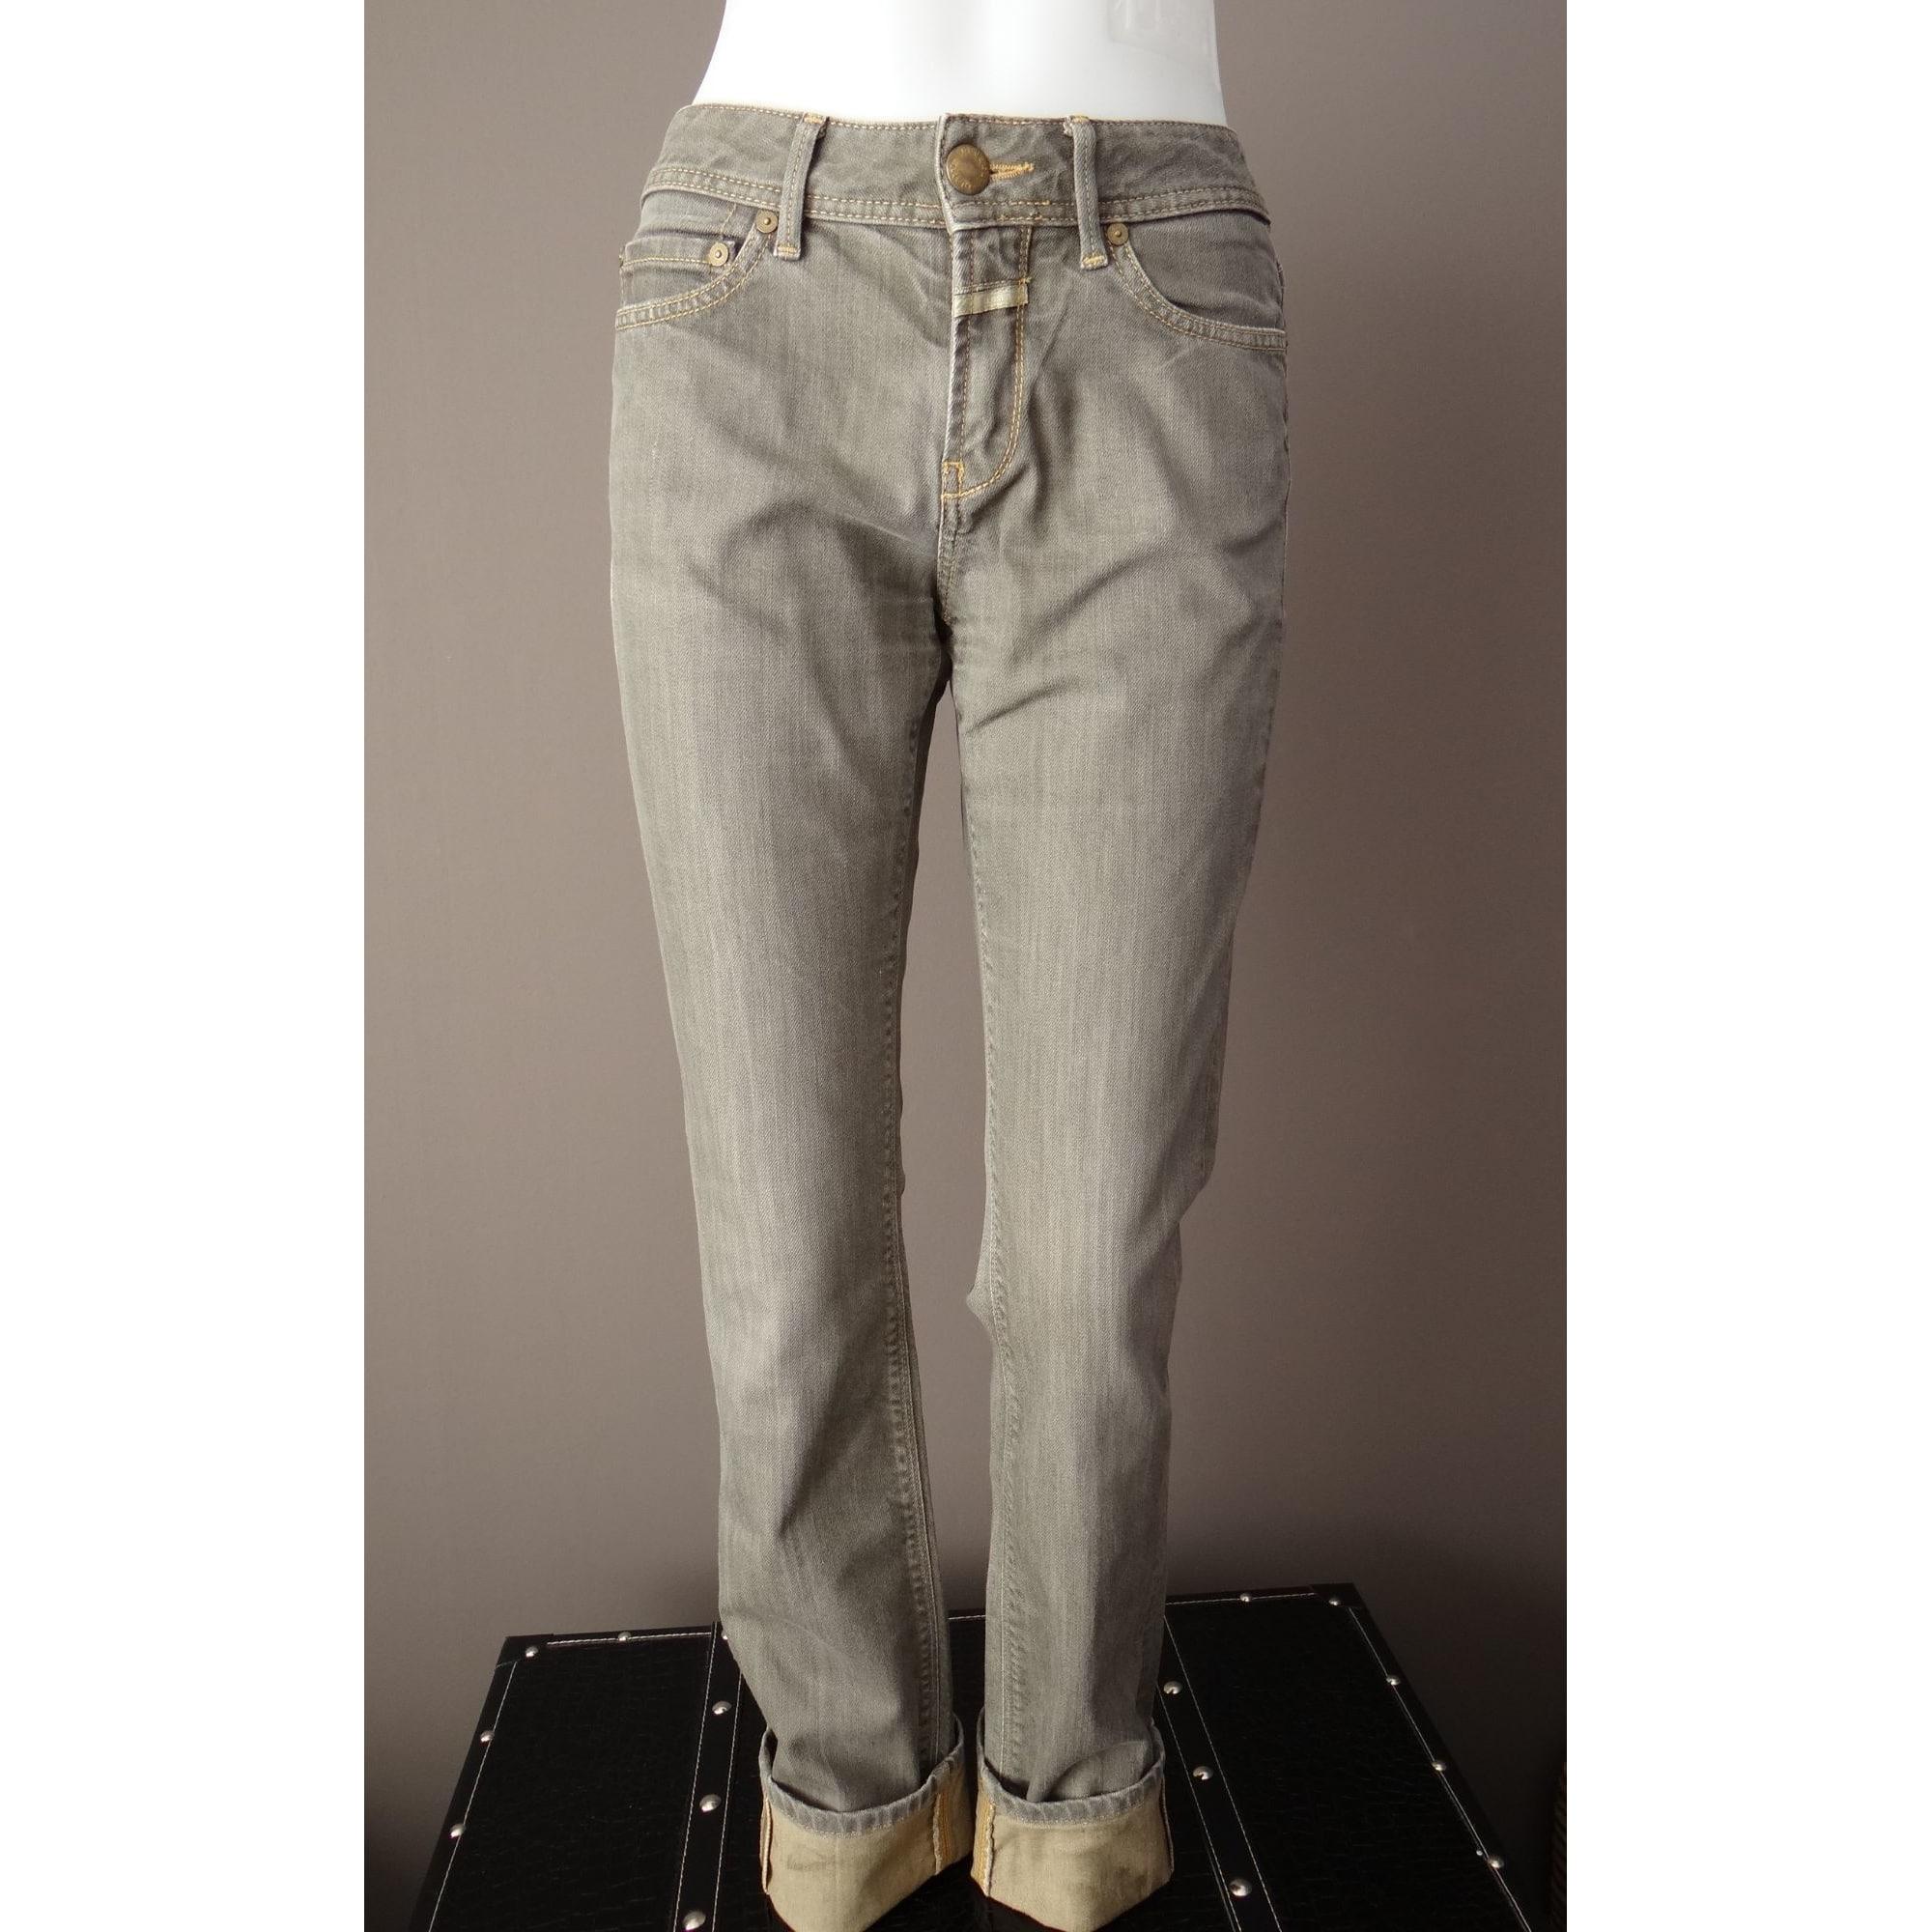 Jeans droit CLOSED Gris, anthracite